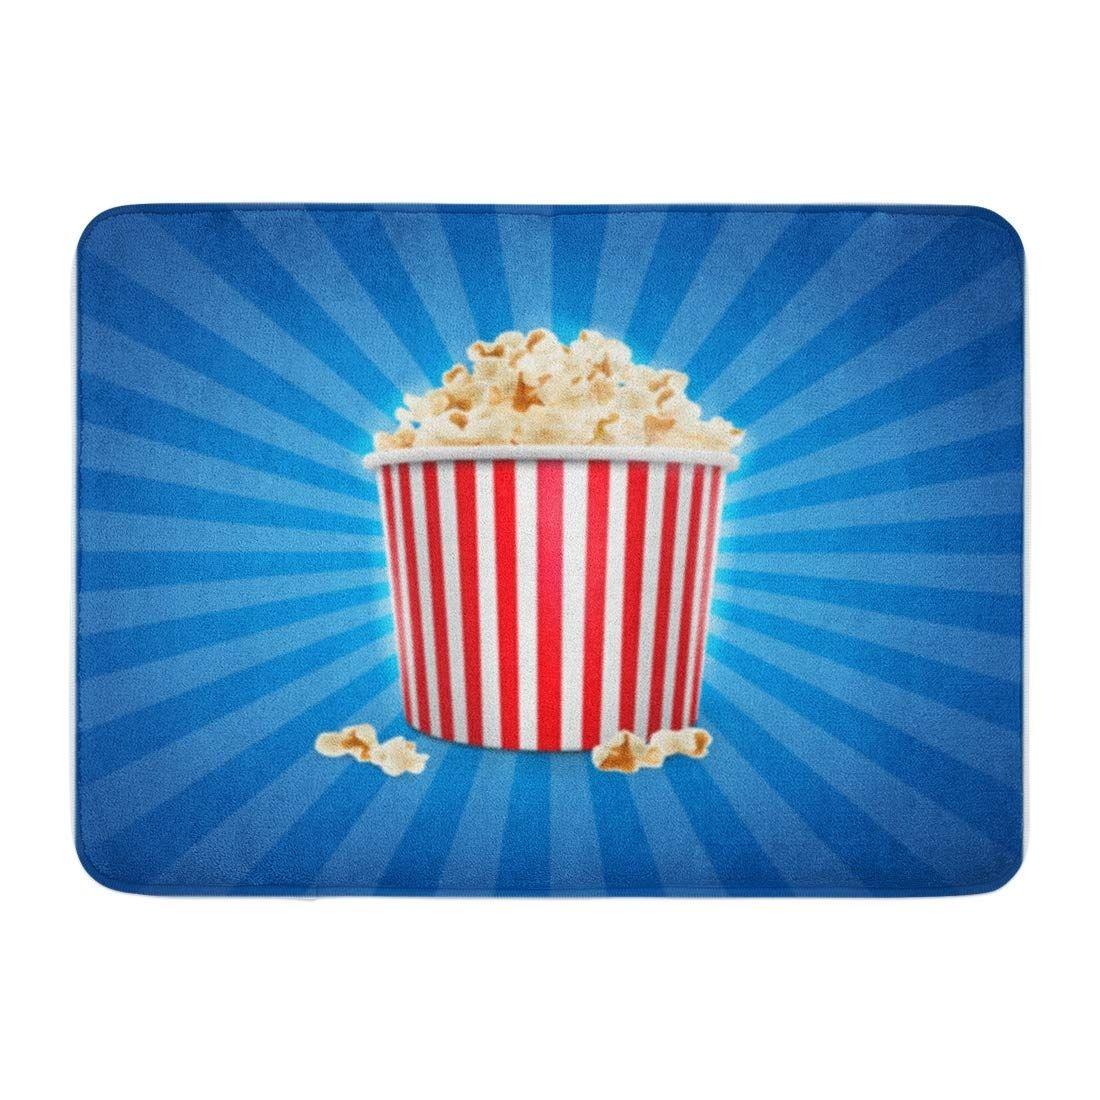 Blue Box Popcorn Food Exploding Pop Object Board Cinema Doormat Floor